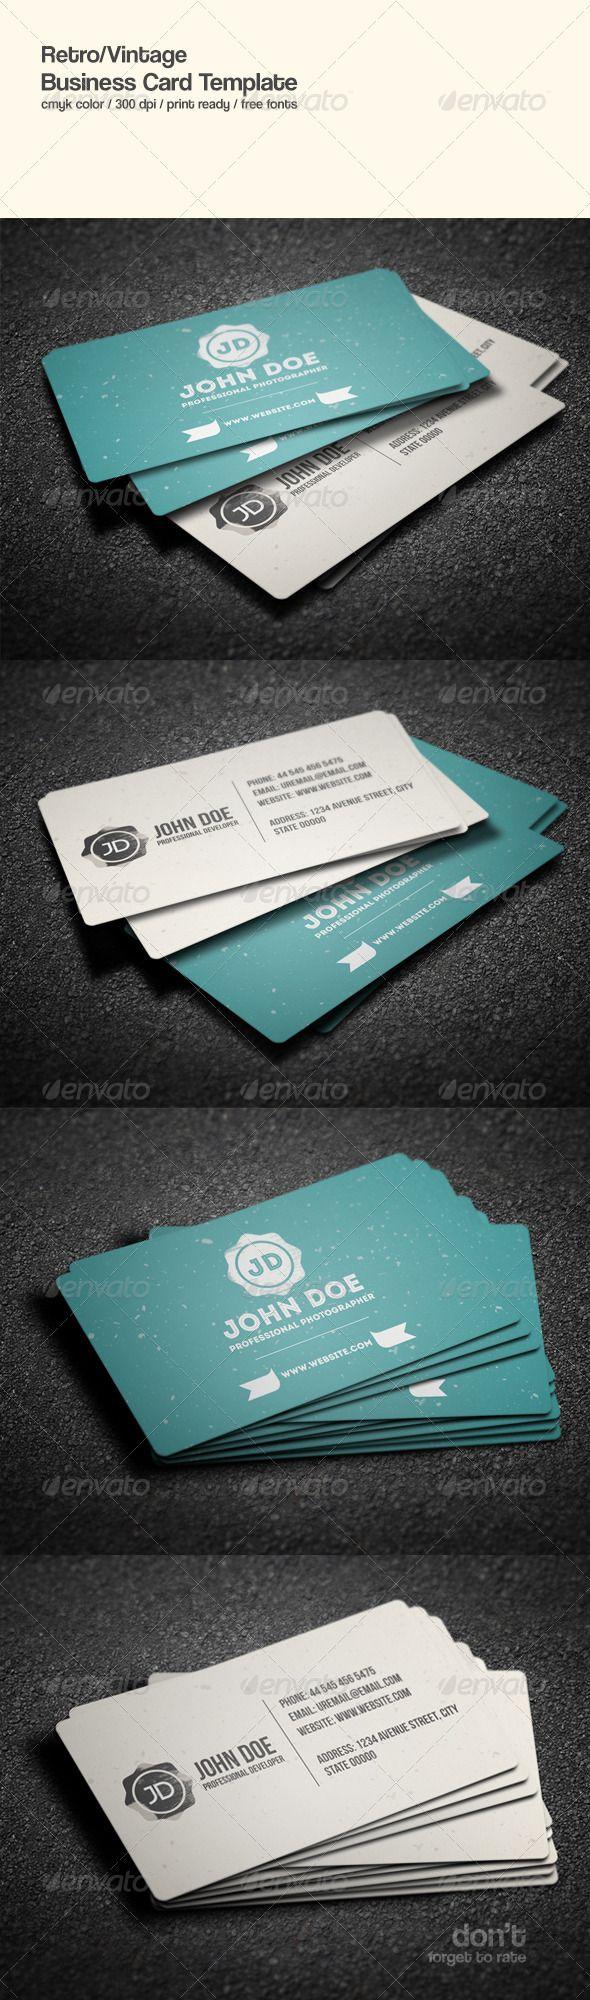 200 Best Business Card Images On Pinterest Carte De Visite